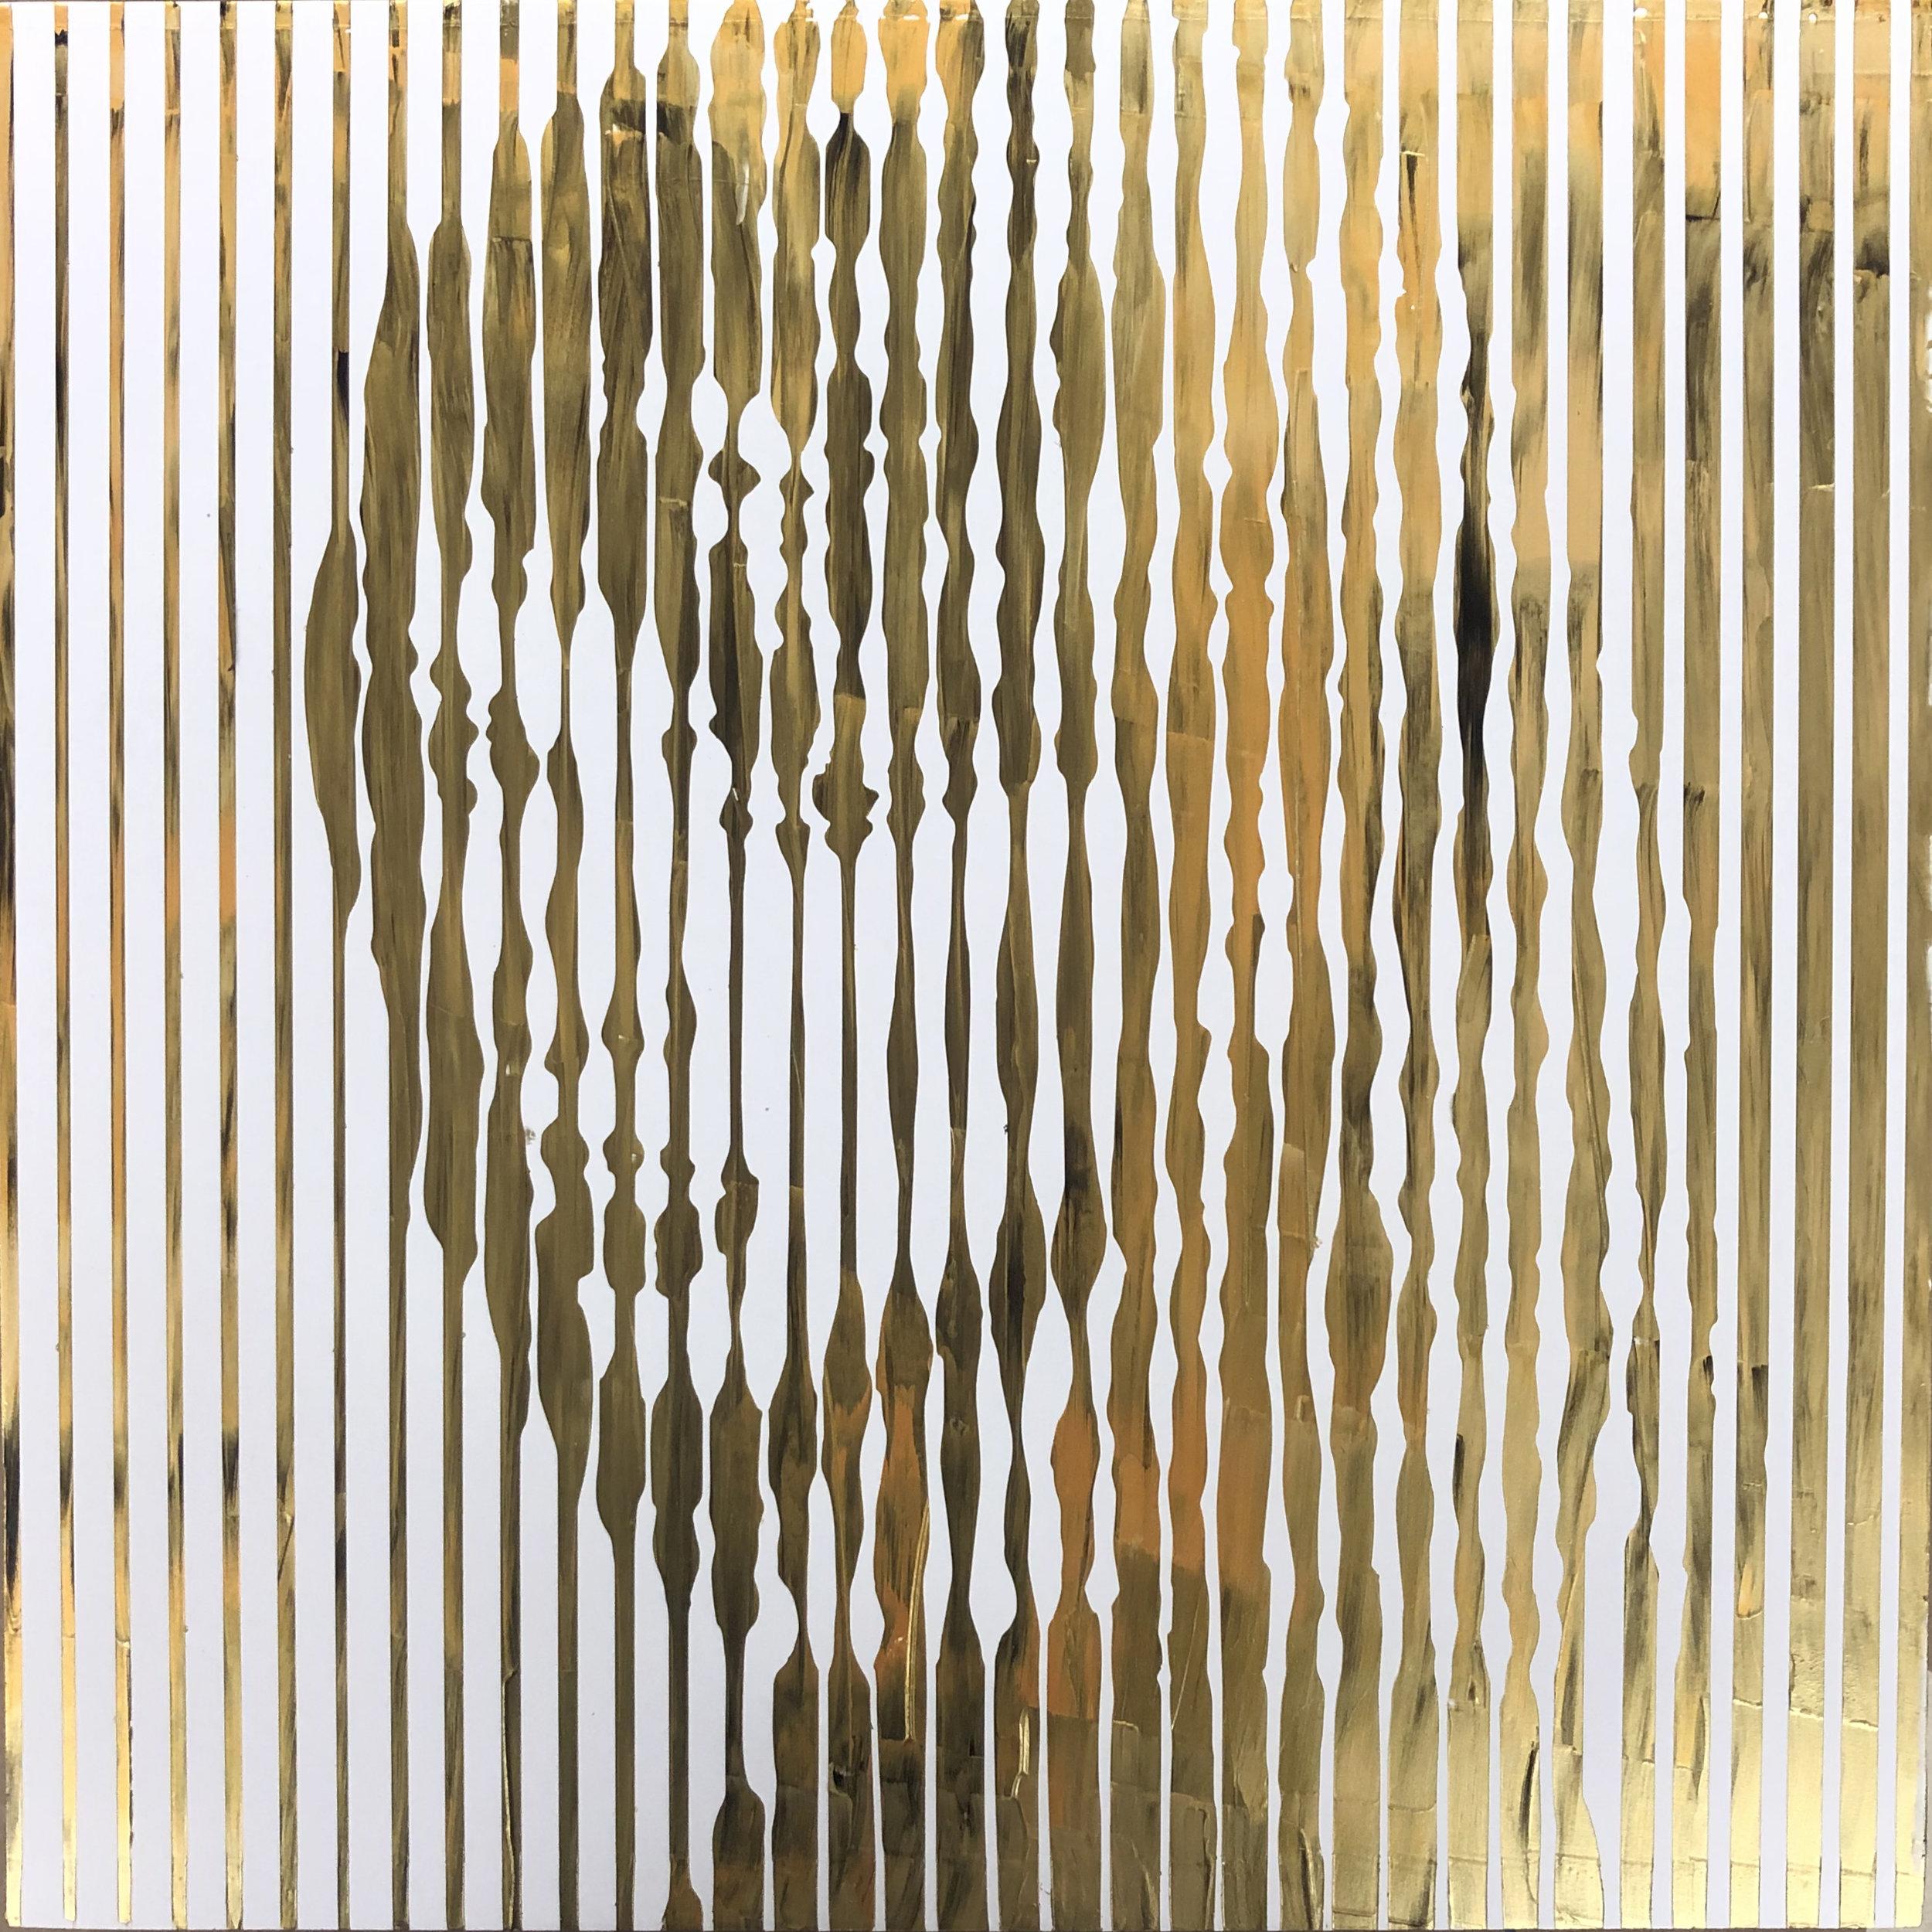 Sean Christopher Ward - Taylor IV - Acrylic on Wood Panel - 16x16x1.5 - 2018 - 500.jpg